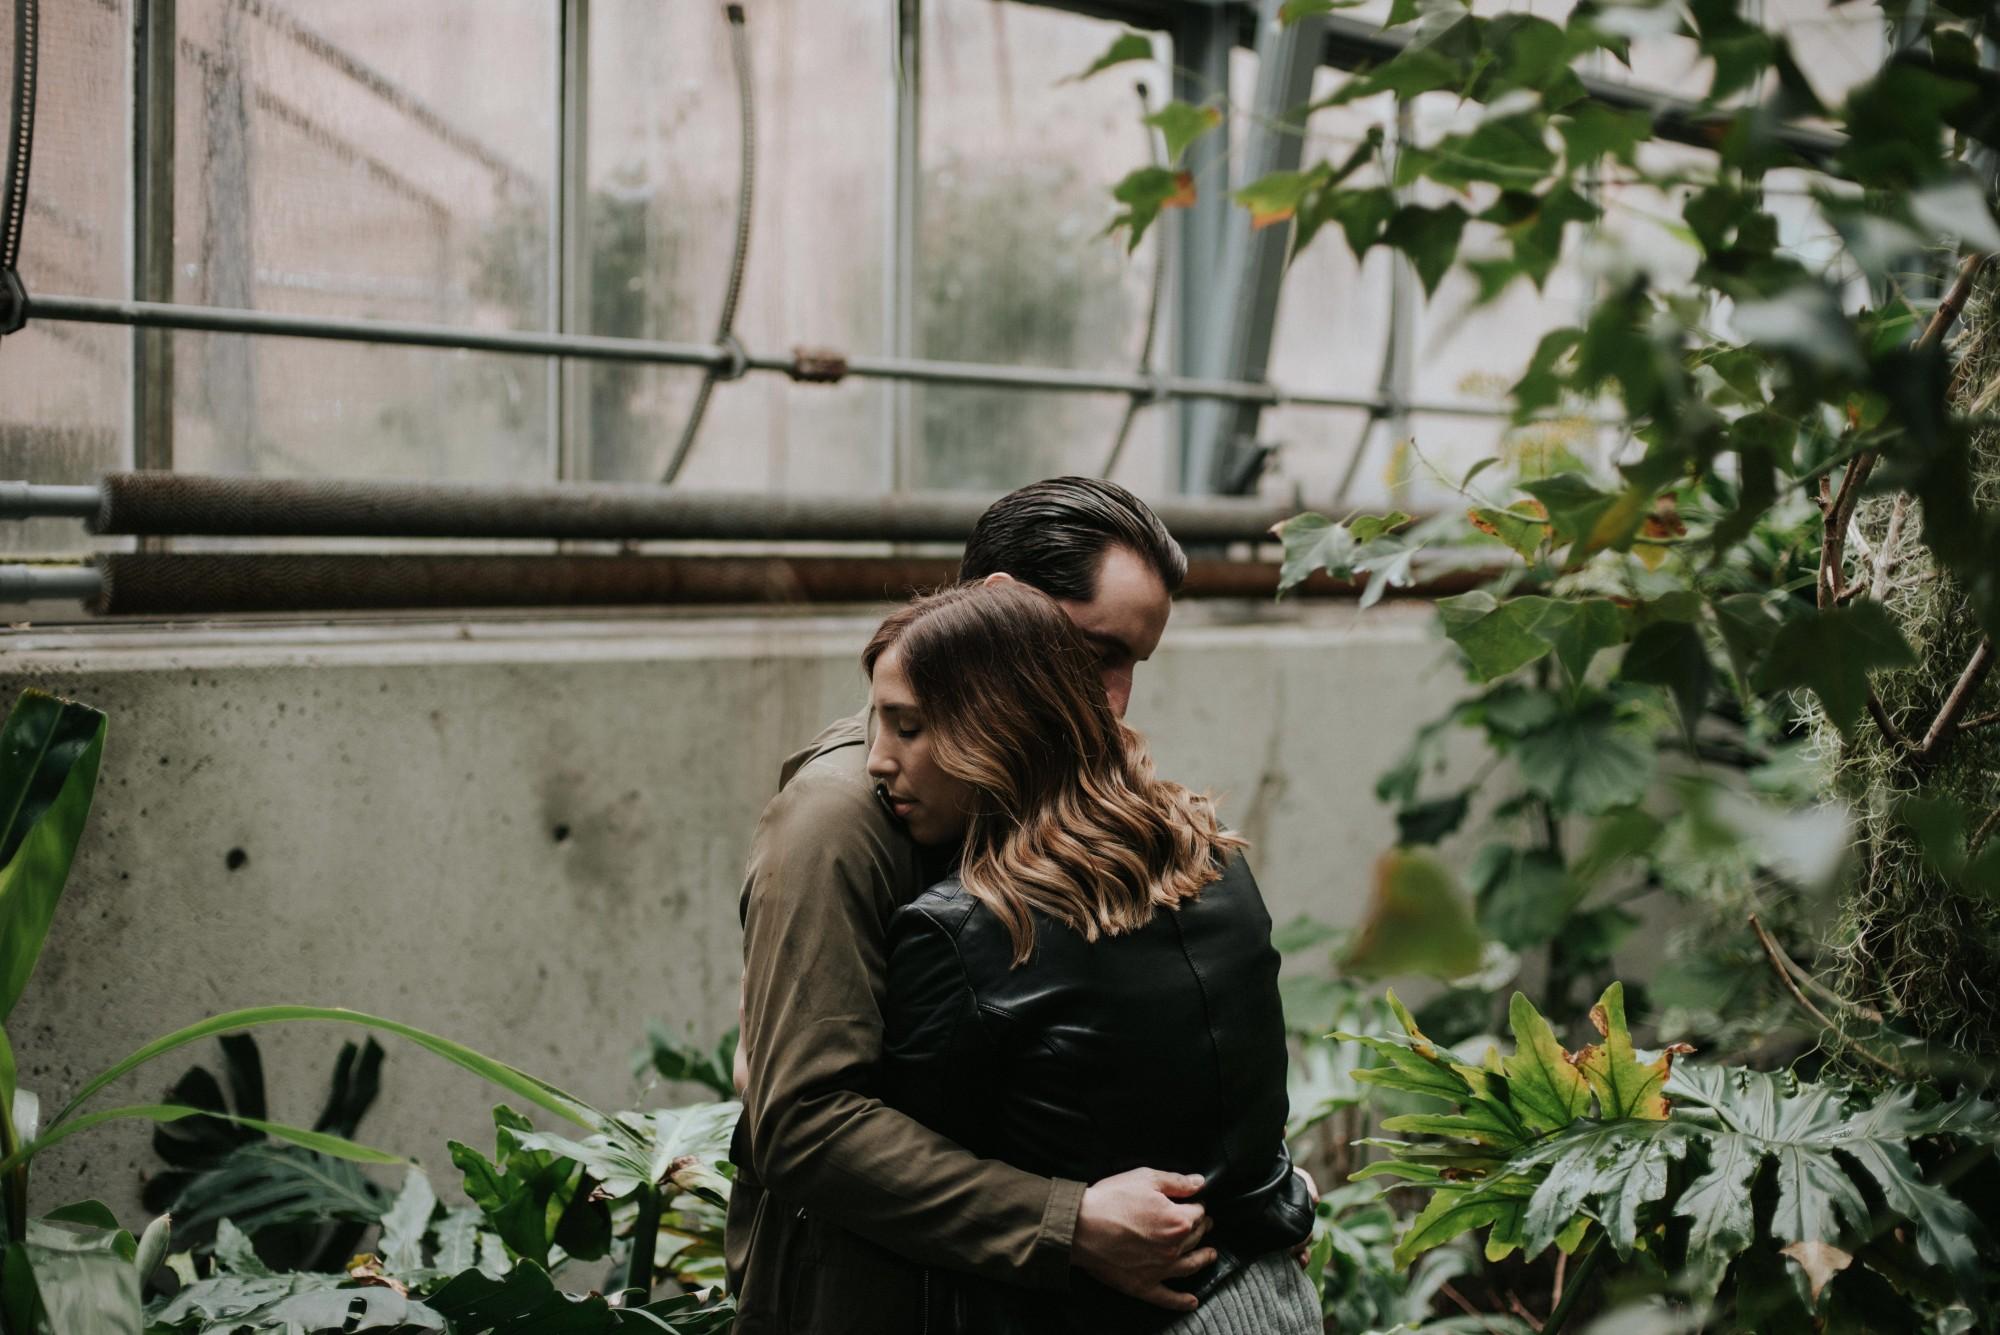 Daring Wanderer Toronto engagement shoot at Cloud Gardens